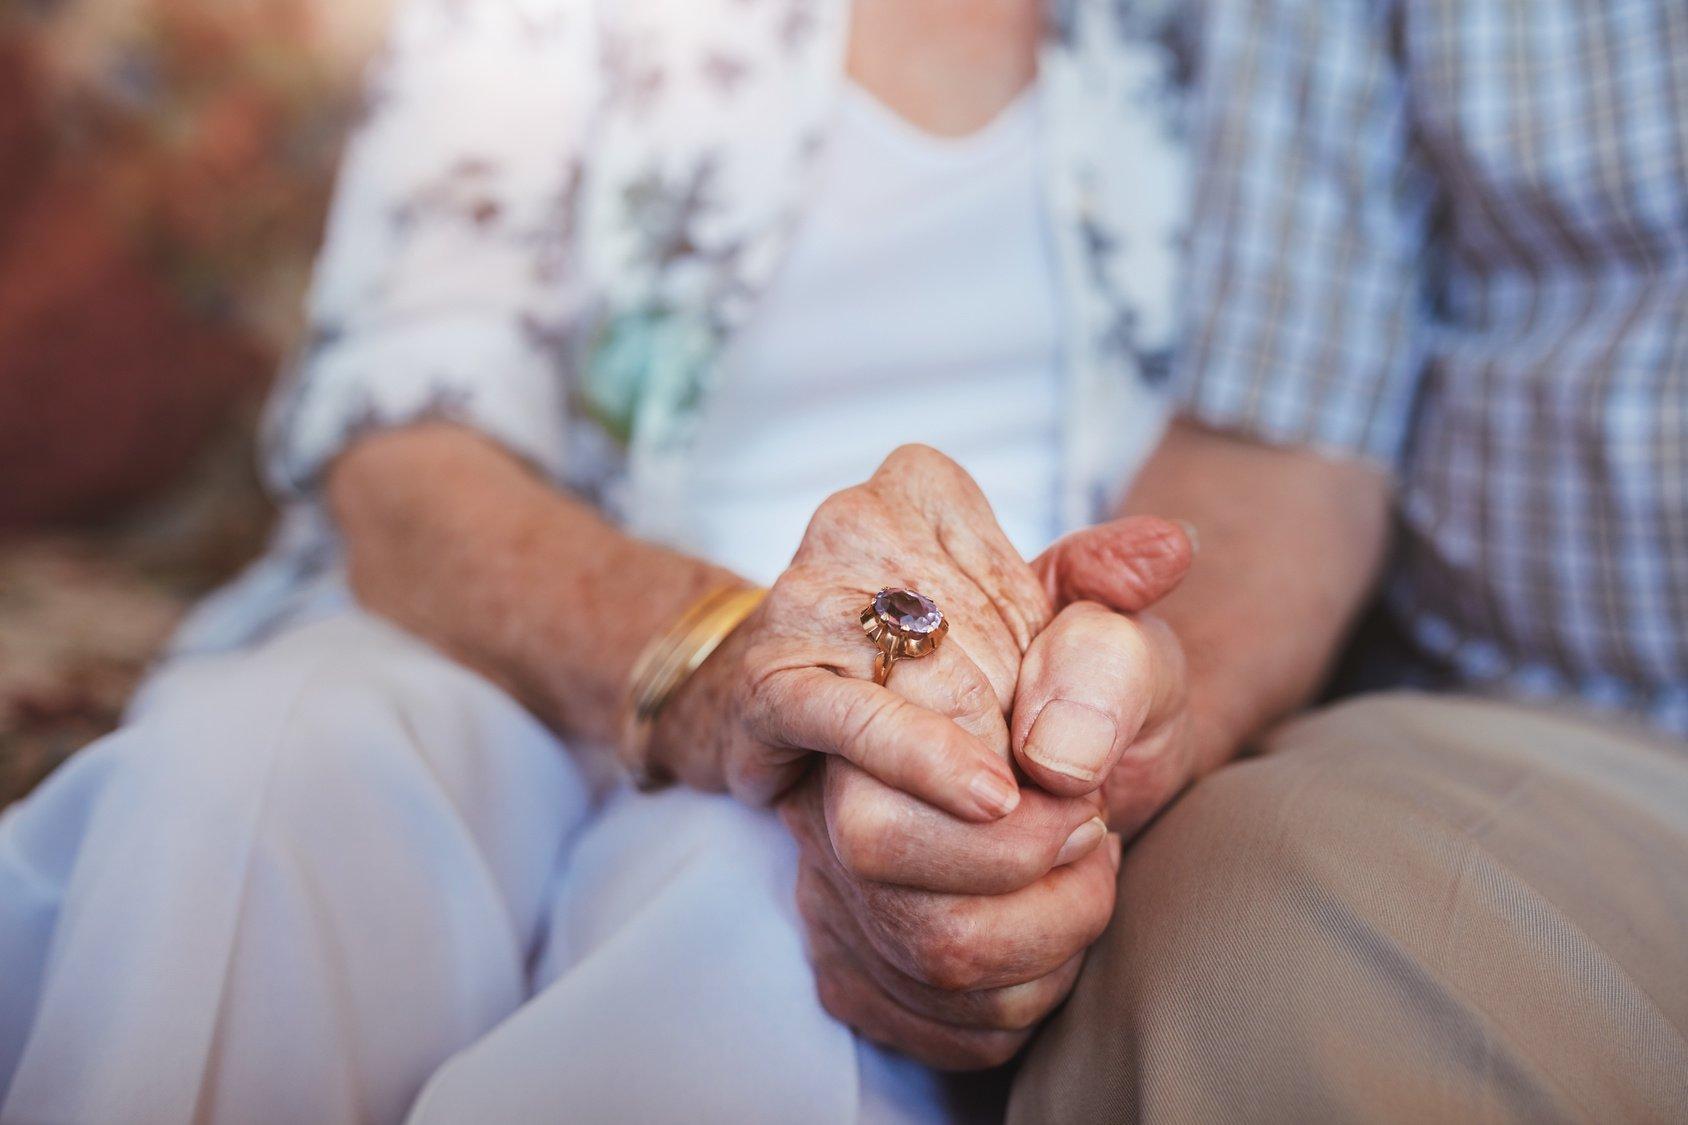 Tips for Understanding and Managing Difficult Dementia Behaviors